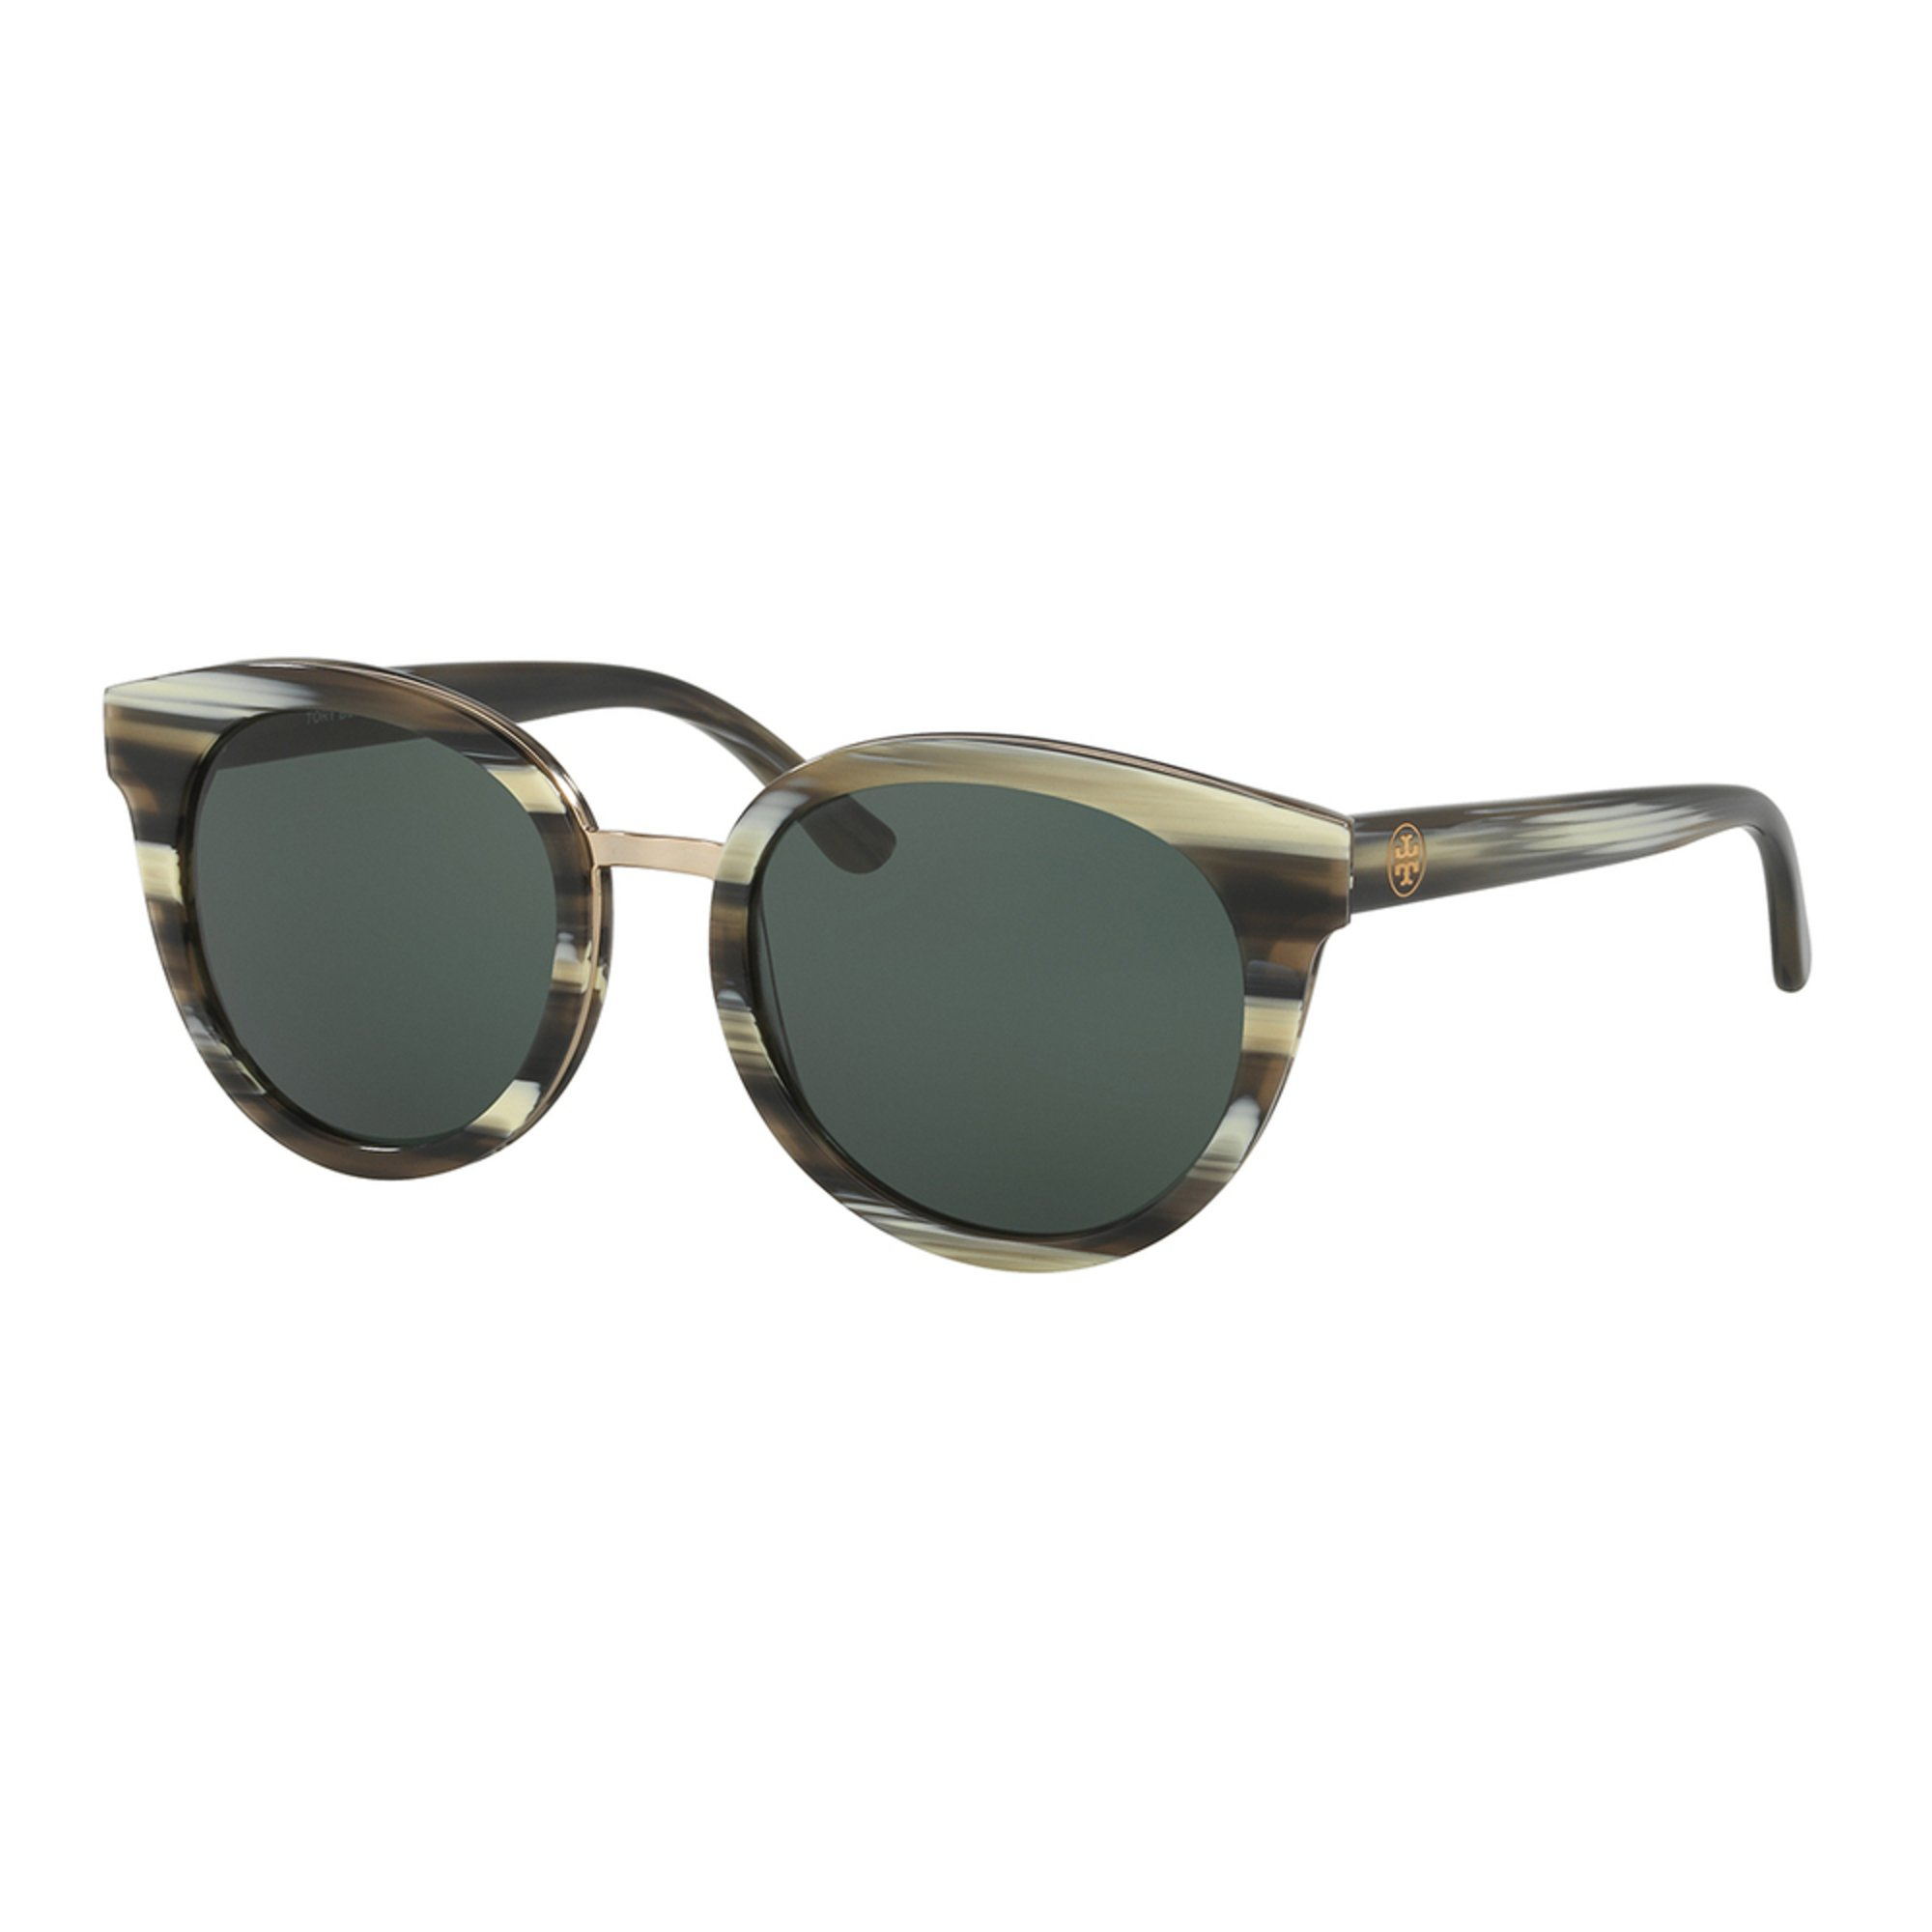 165a3ddf994 Tory Burch. Tory Burch Women s Panama Sunglasses